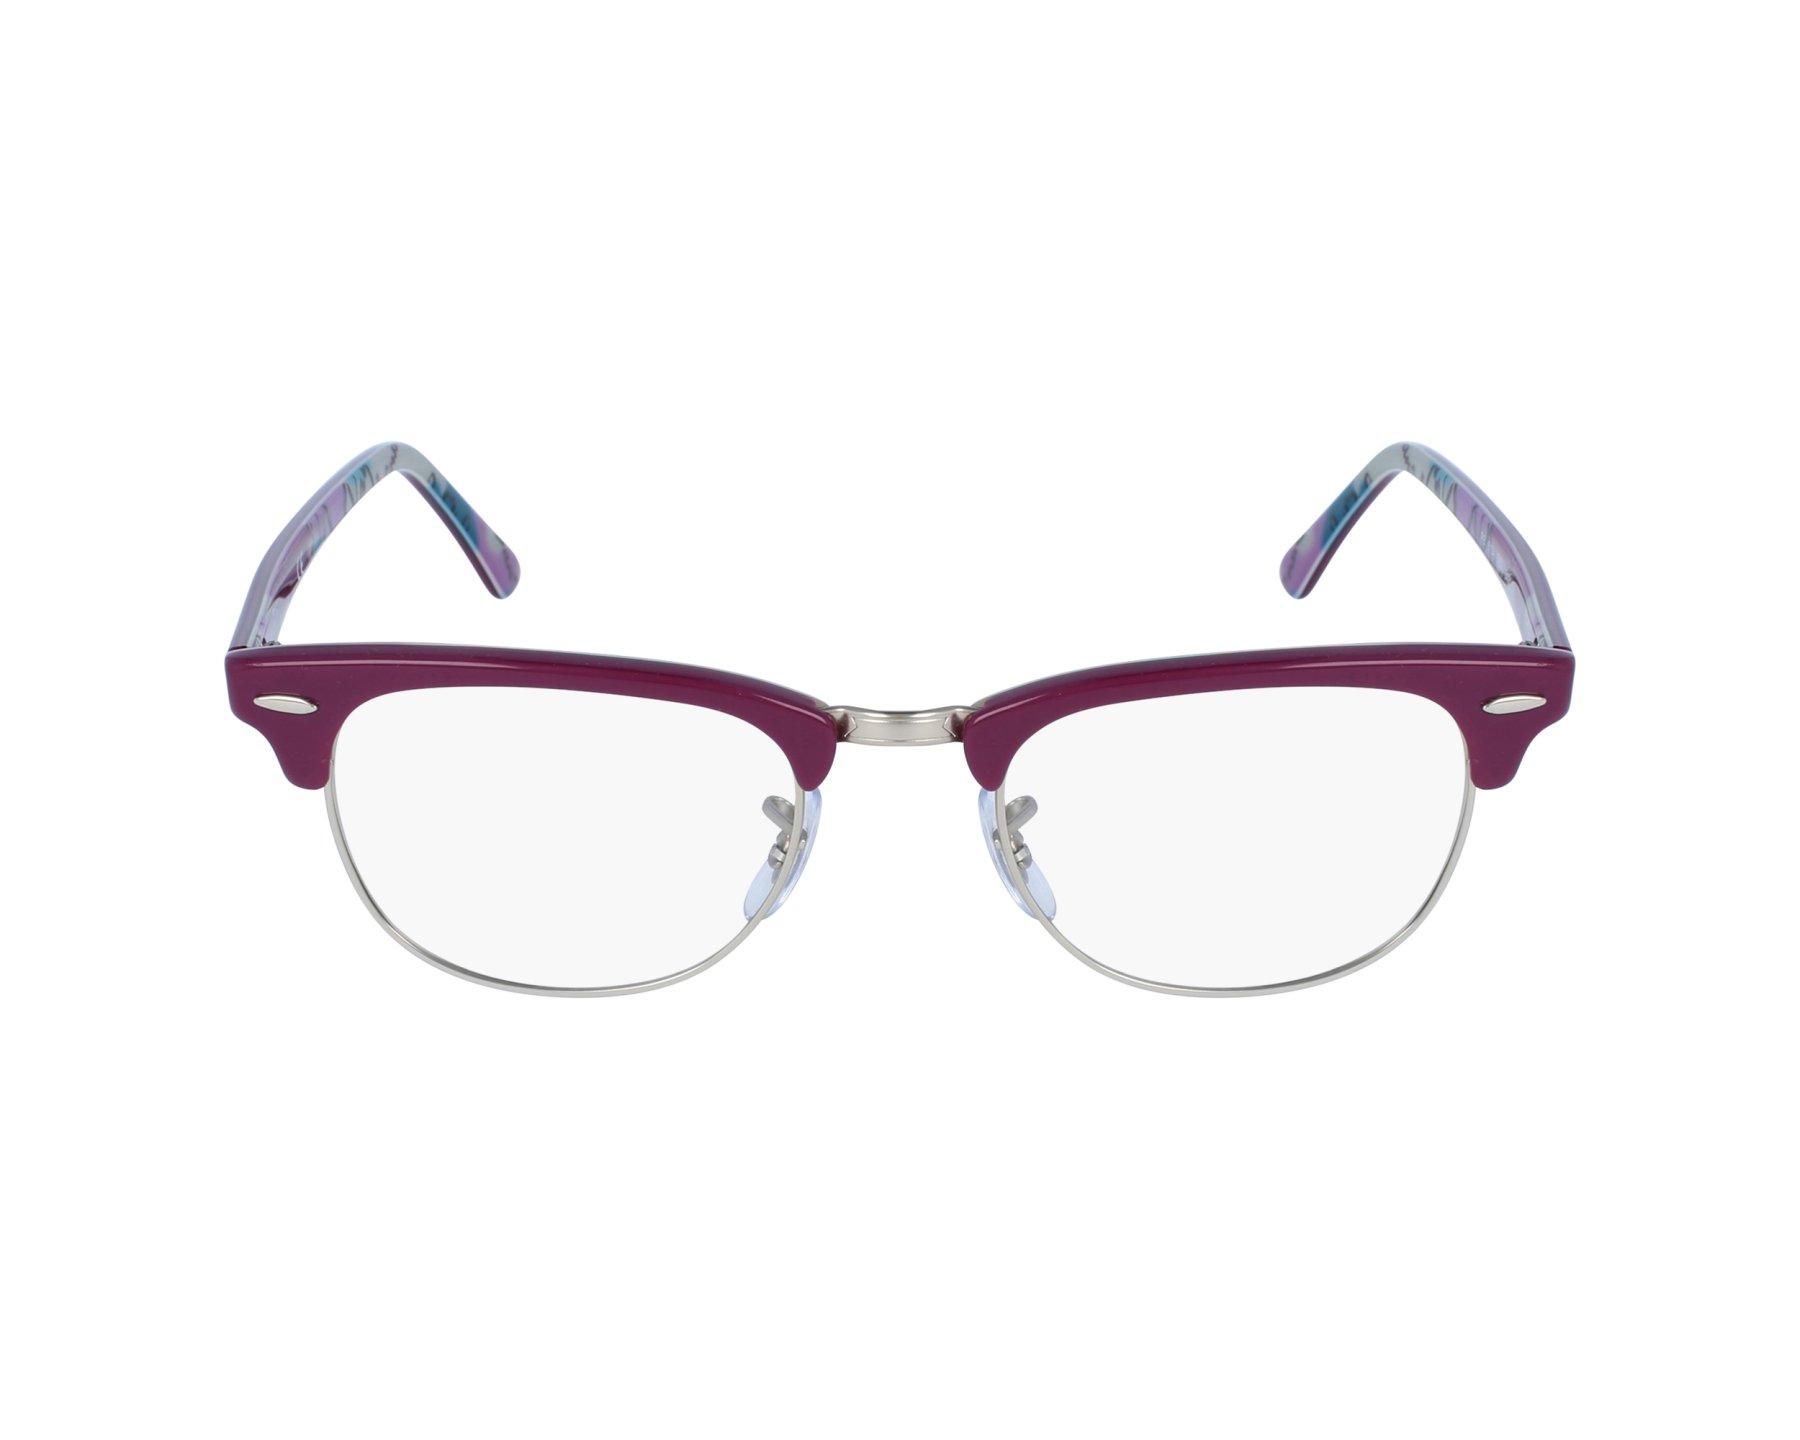 80868b2c208 eyeglasses Ray-Ban RX-5154 5652 49-21 Purple Silver profile view